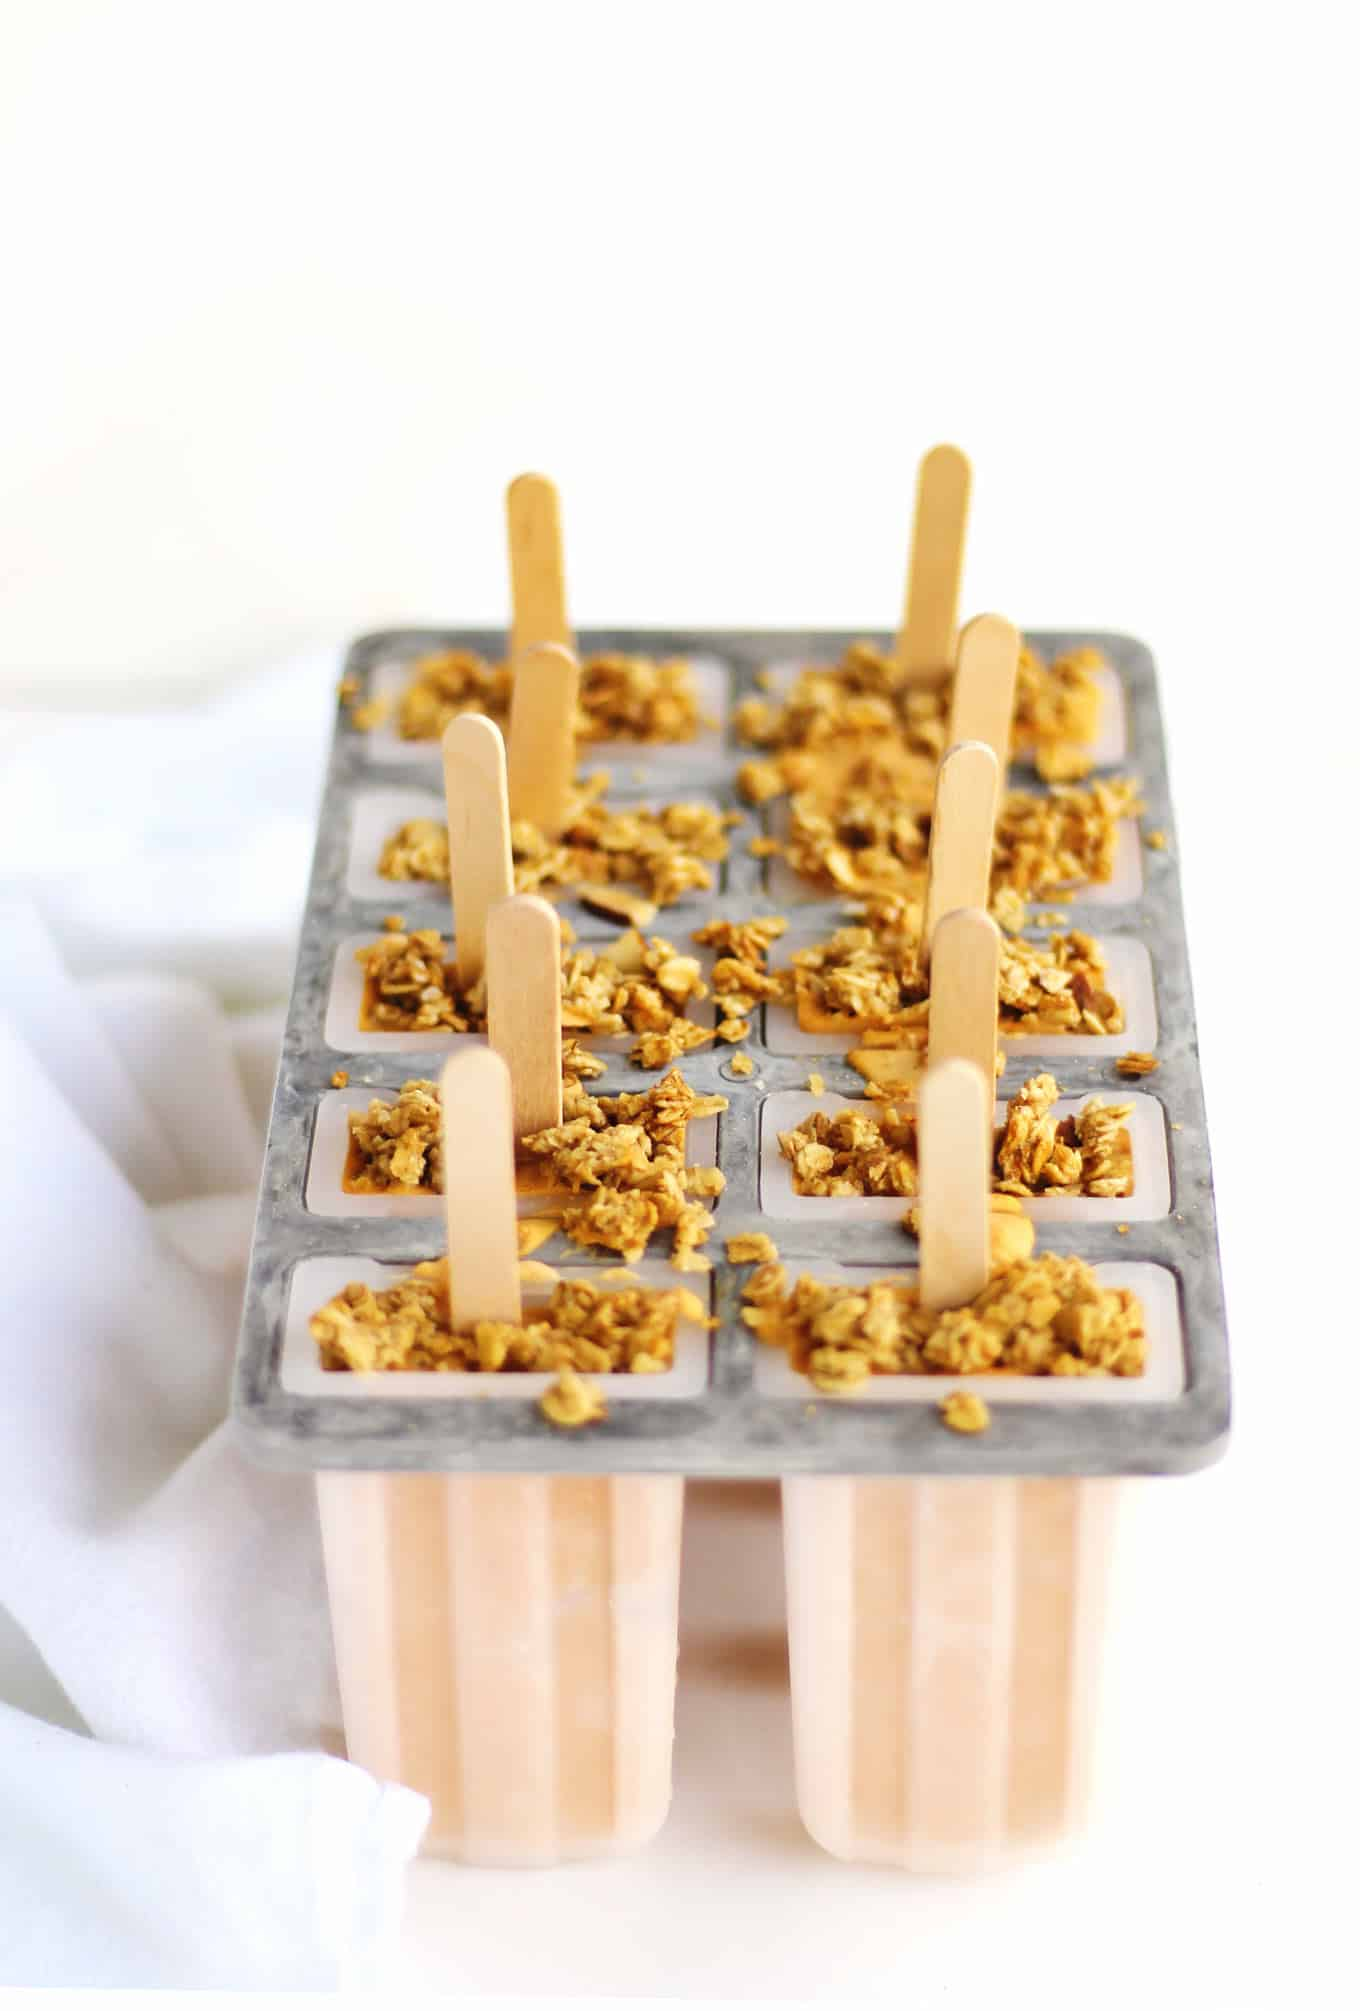 Healthy pumpkin cheesecake breakfast popsicles recipe! These parfait pops blend yogurt, pumpkin puree, pumpkin pie spice, and granola to make a creamy, autumn breakfast. YUM! // Rhubarbarians //